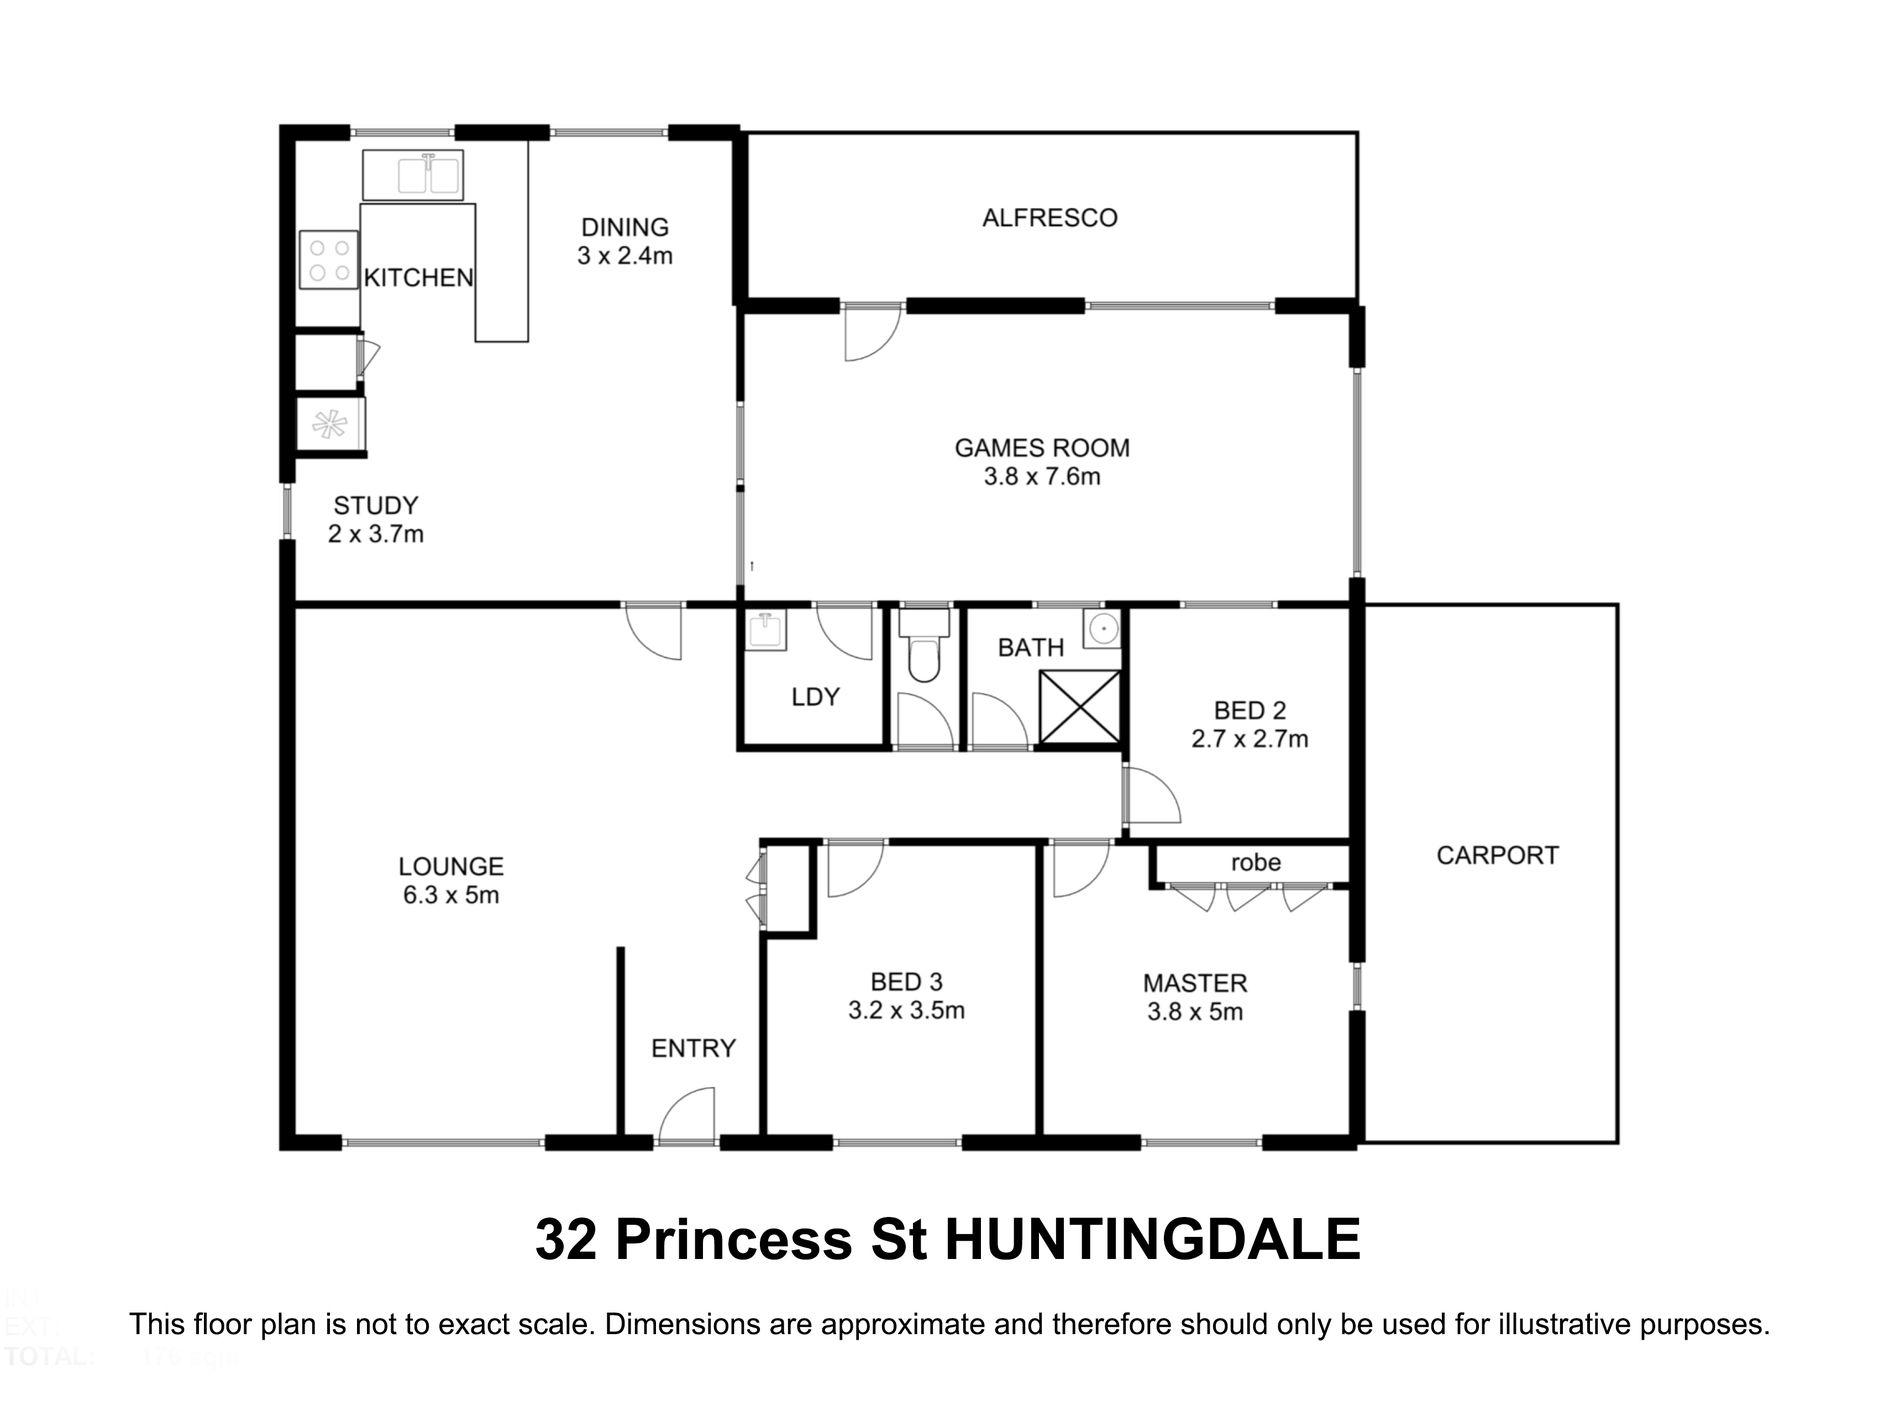 32 Princess Street, Huntingdale